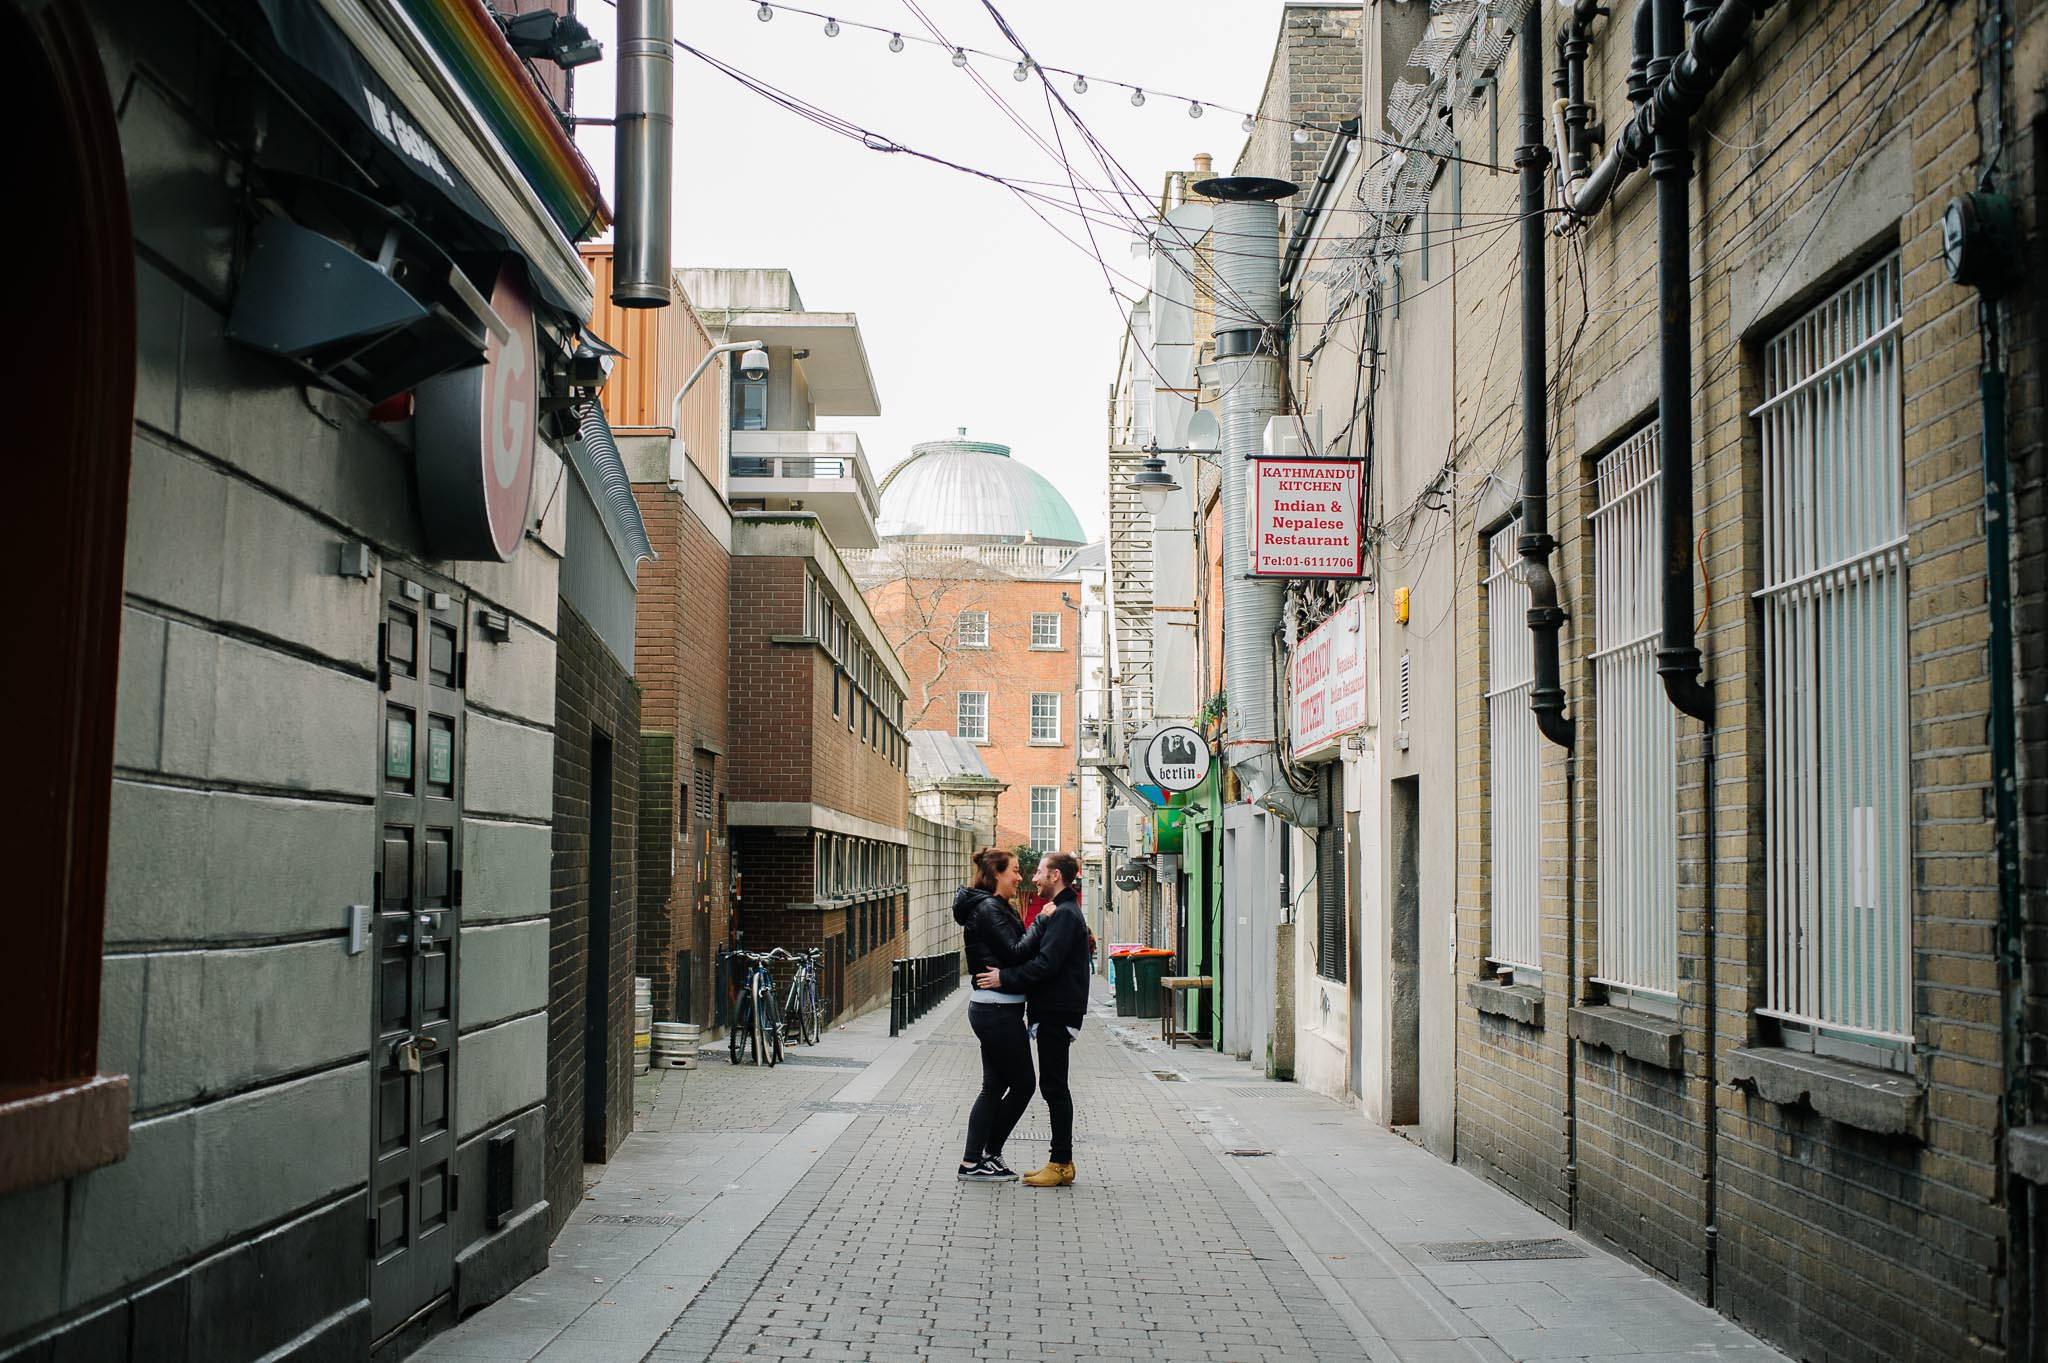 DublinCityEngagementPhotographyIreland-1.jpg